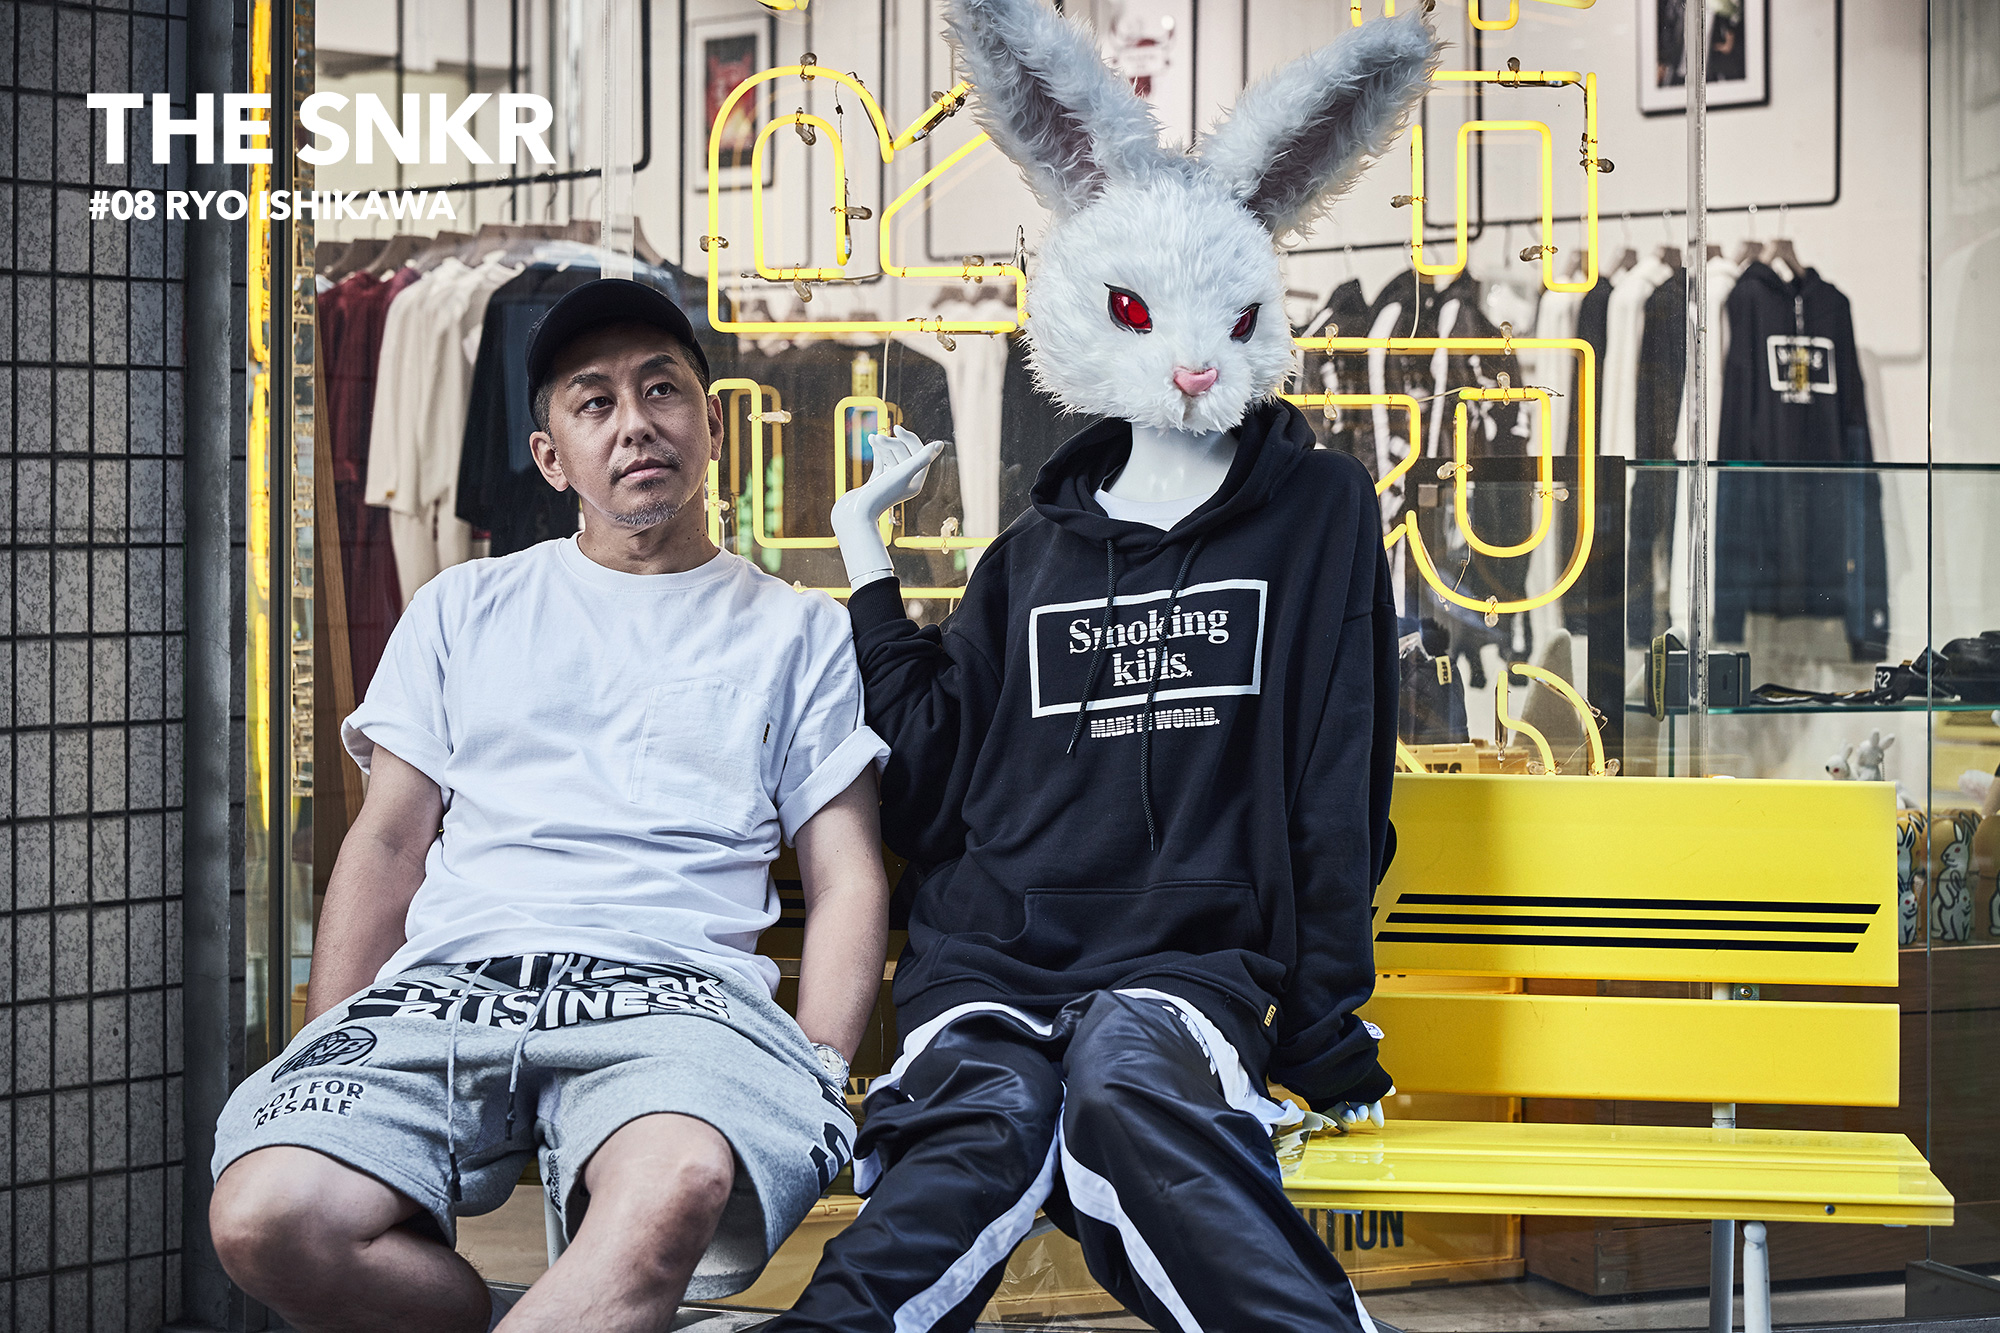 THE SNKR #08 FR2 石川涼のインタビュー写真1